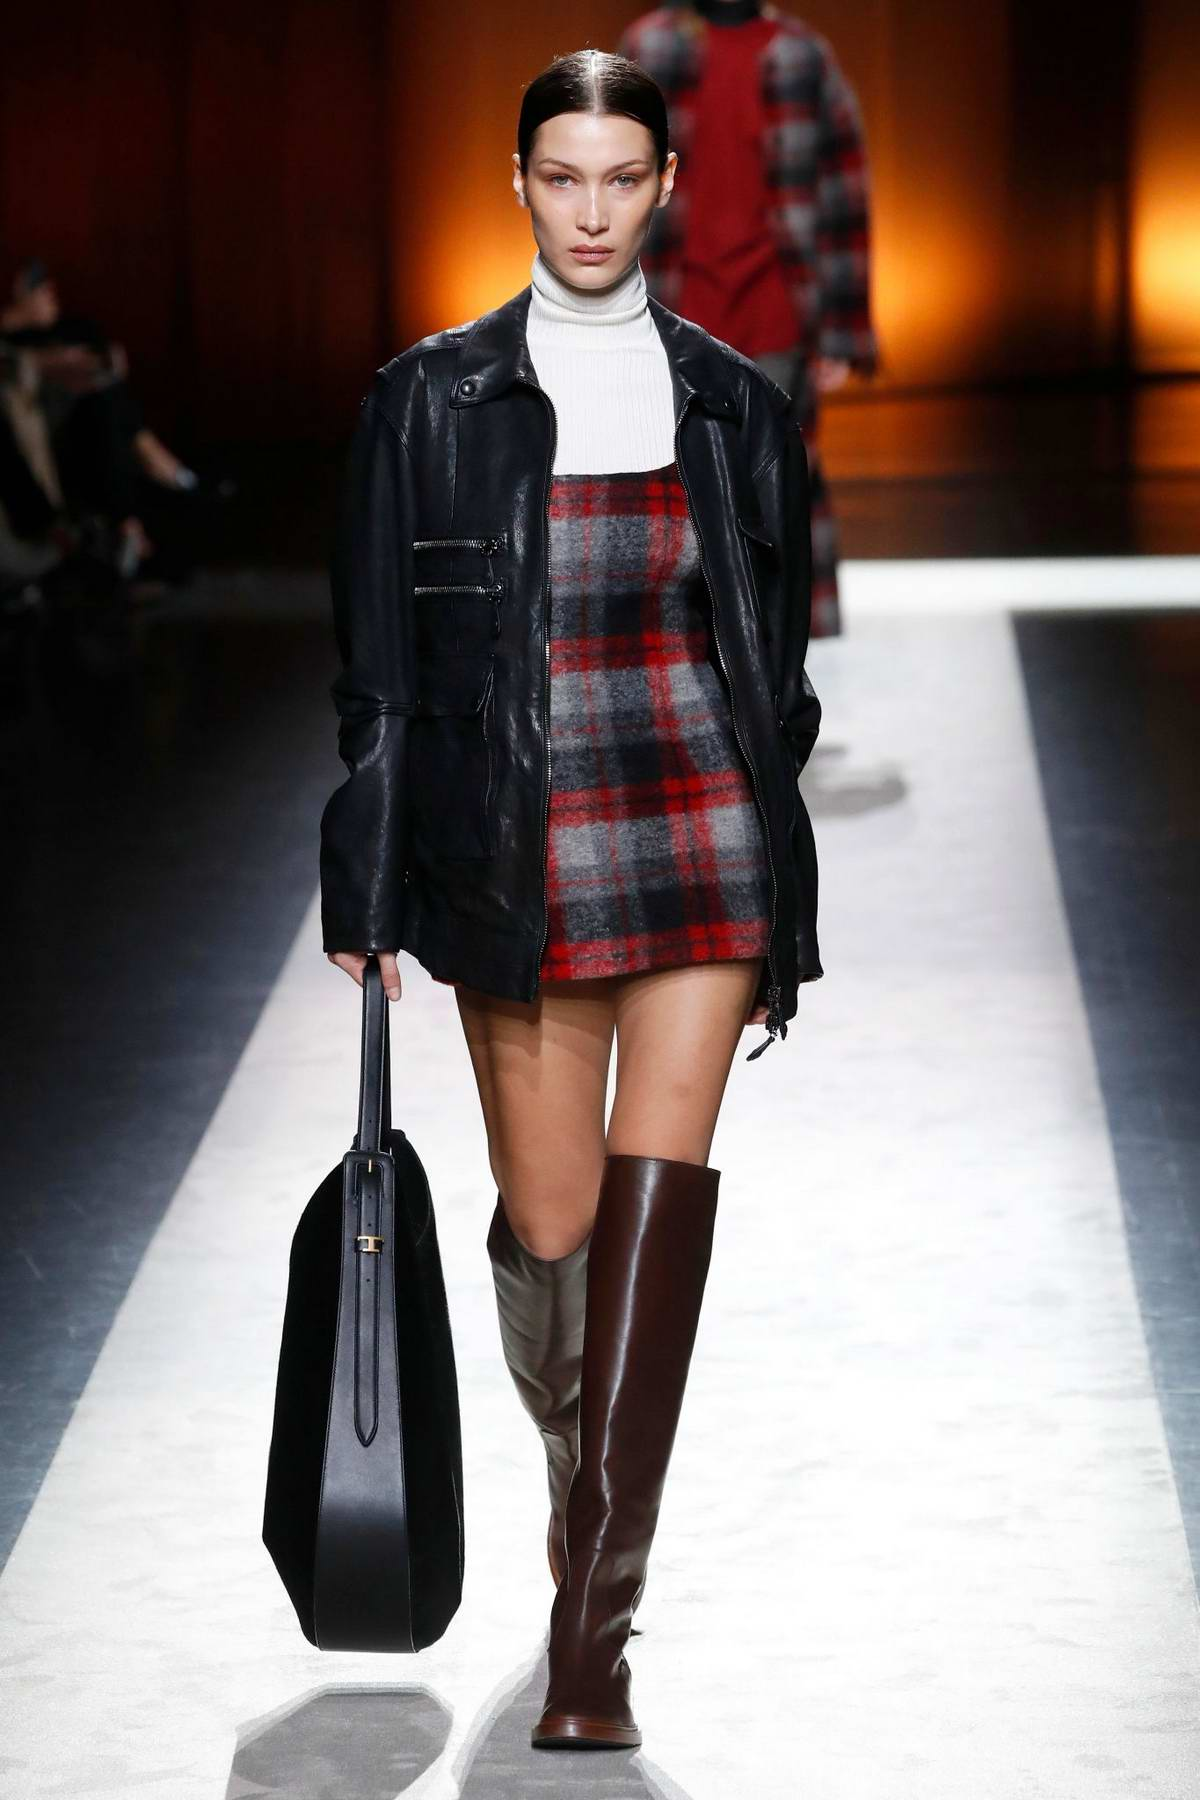 Bella Hadid walks the runway at the Tod's fashion show, F/W 2020 during Milan Fashion Week in Milan, Italy